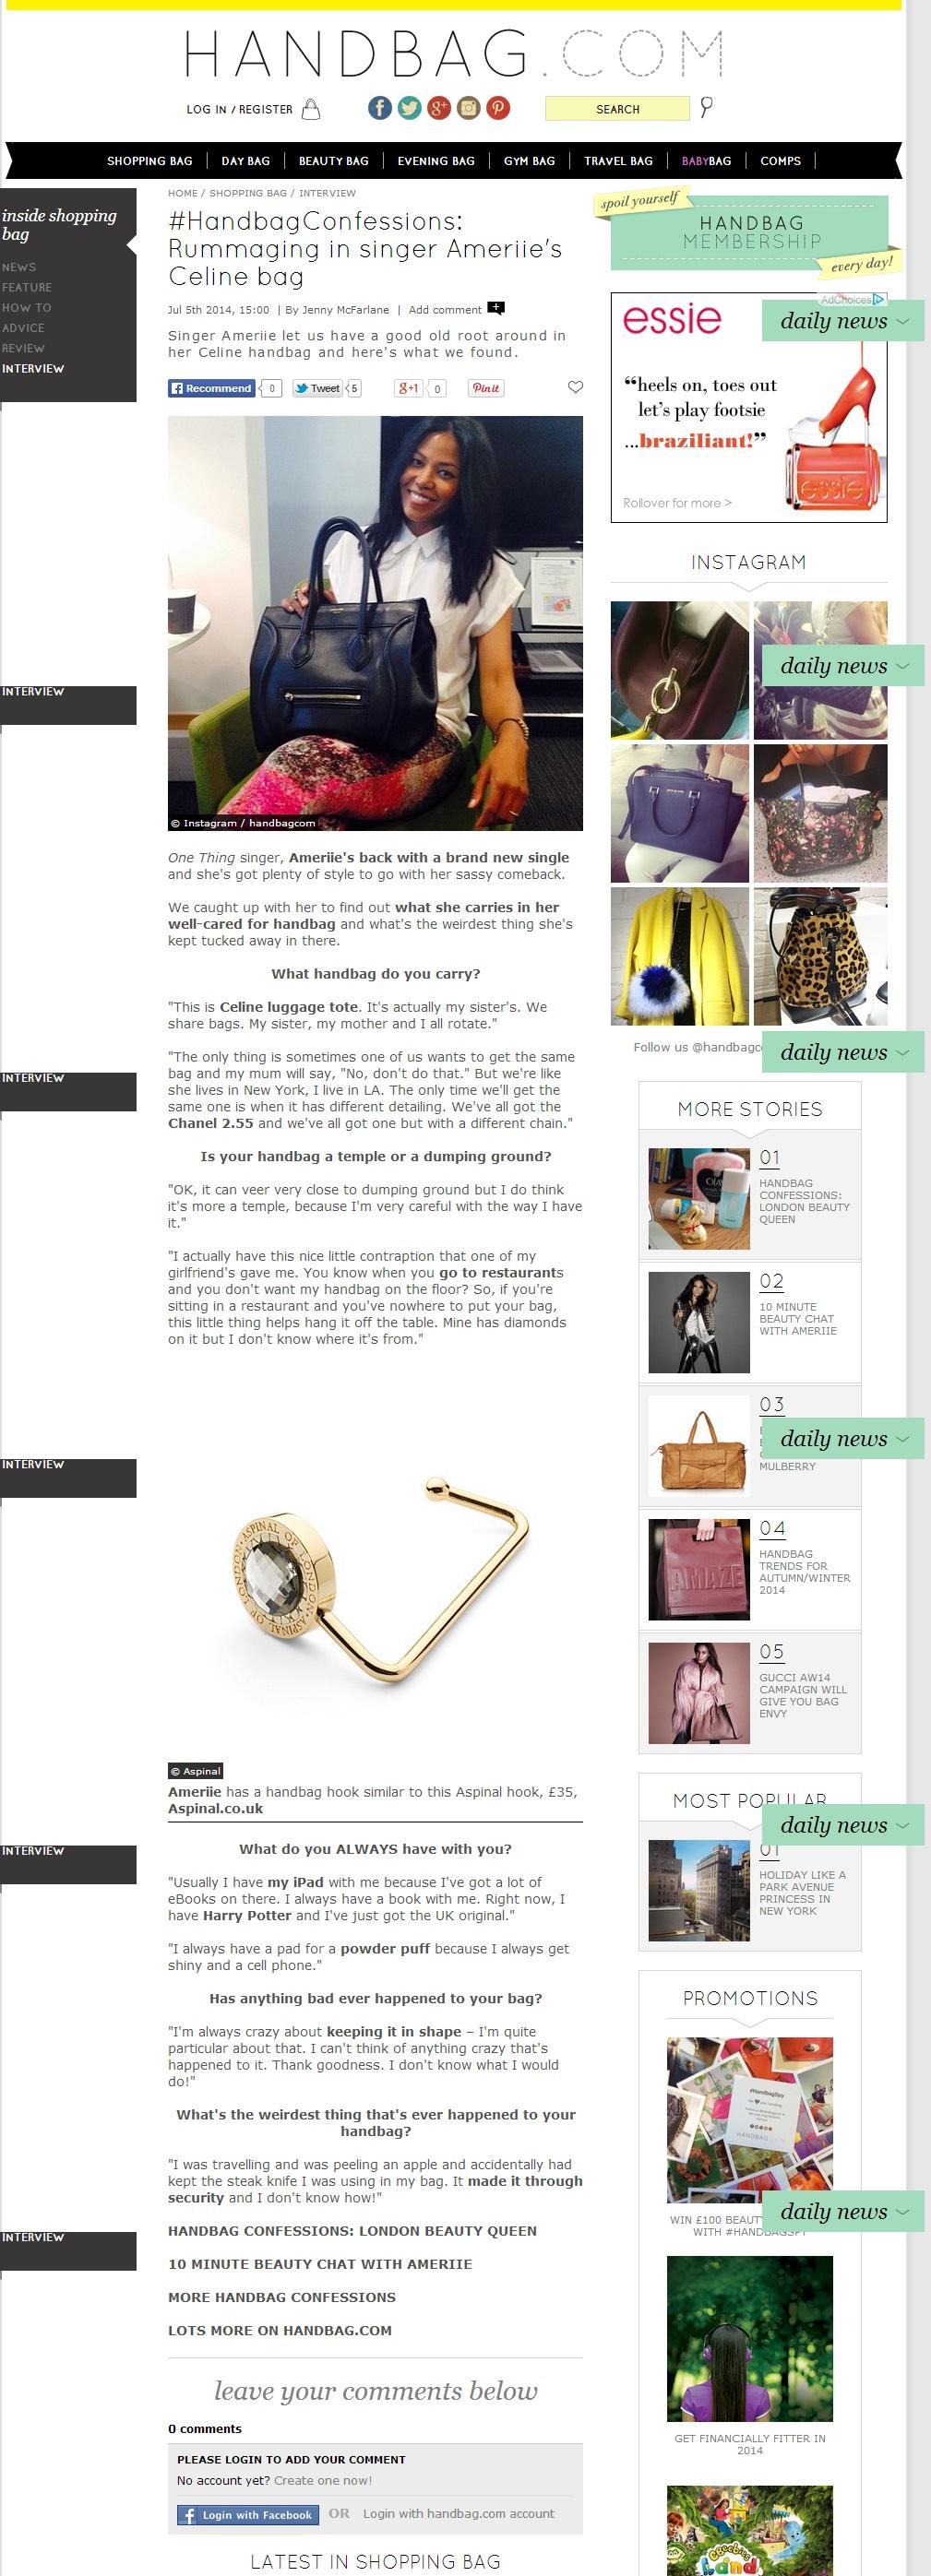 screencapture-www-handbag-com-shopping-bag-interviews-a581782-handbagconfessions-rummaging-in-singer-ameriies-celine-bag-html